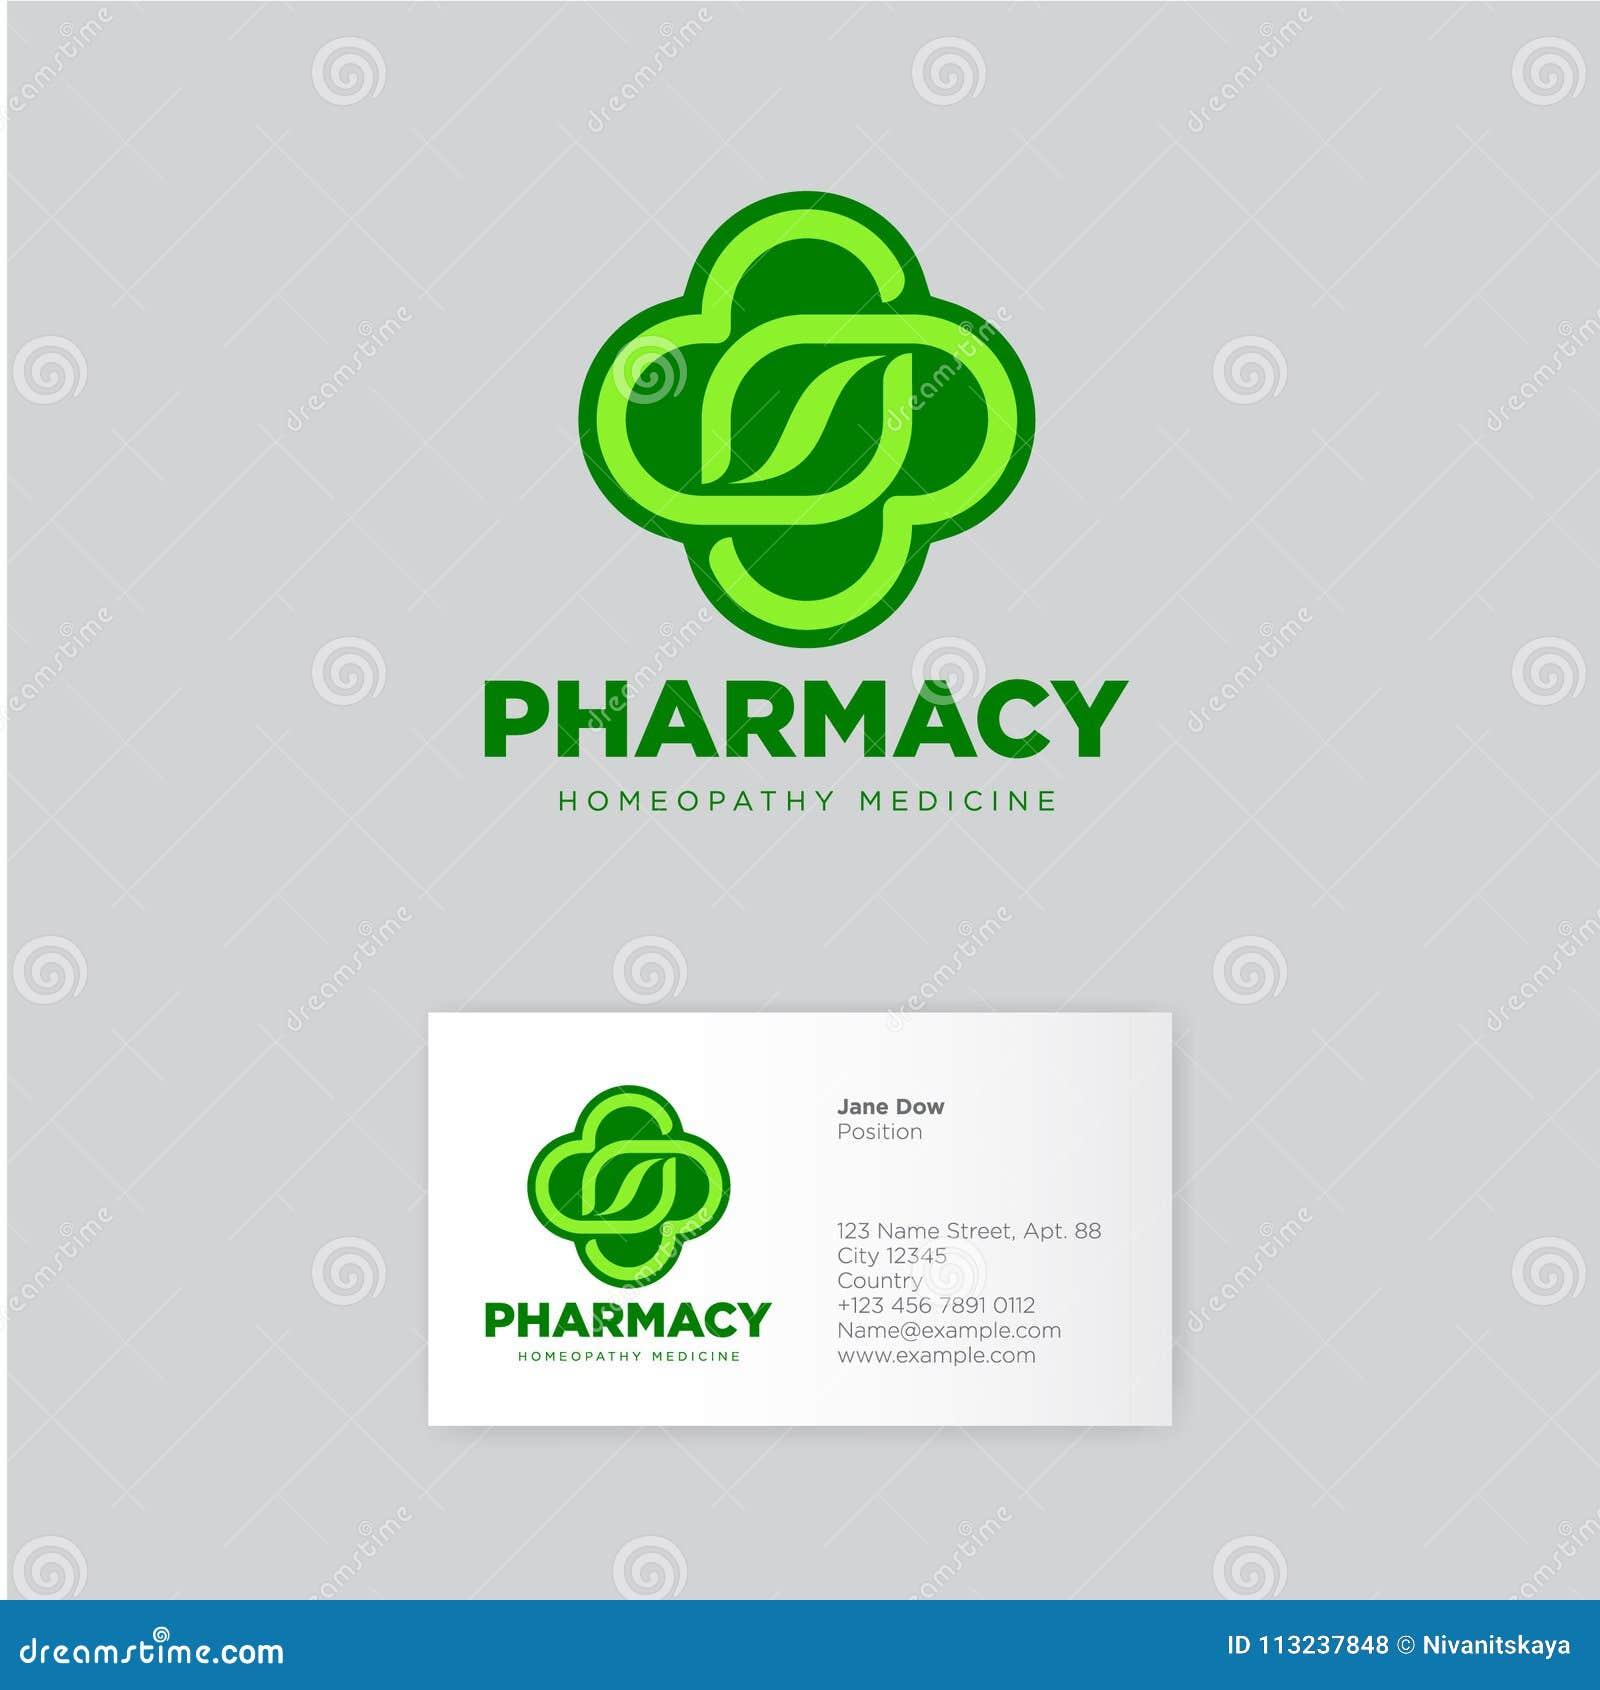 Logo D Homeopathie De Pharmacie Graphisme Vert Embleme Fines Herbes Identite Carte